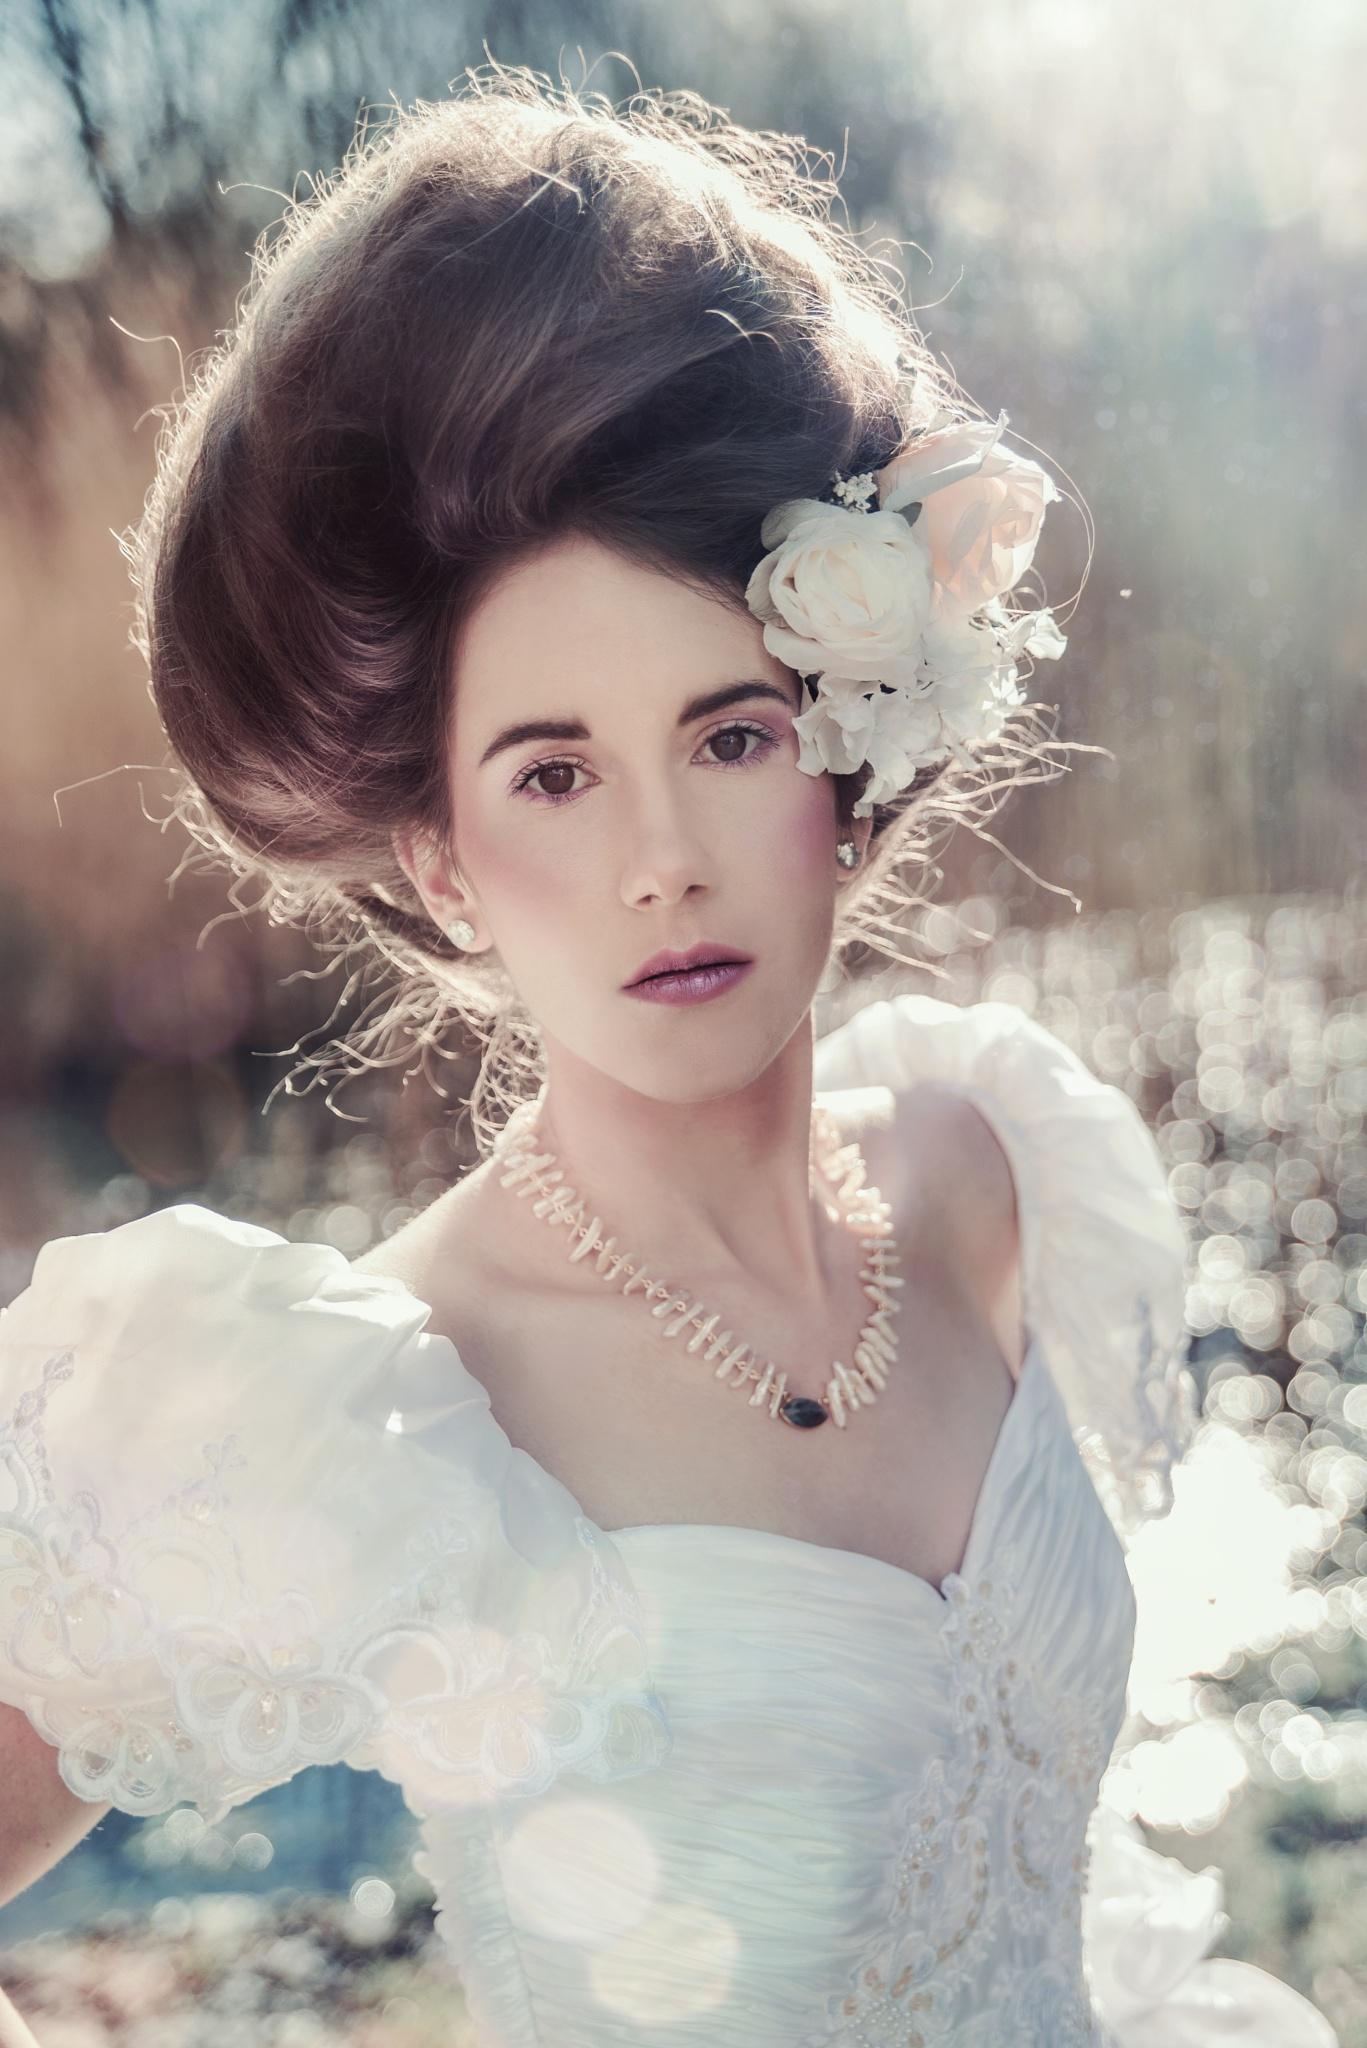 Photo in Portrait #hair #light #girl #flowers #sunlight #woman #white dress #necklace #stare #innocence #extravagant elegance